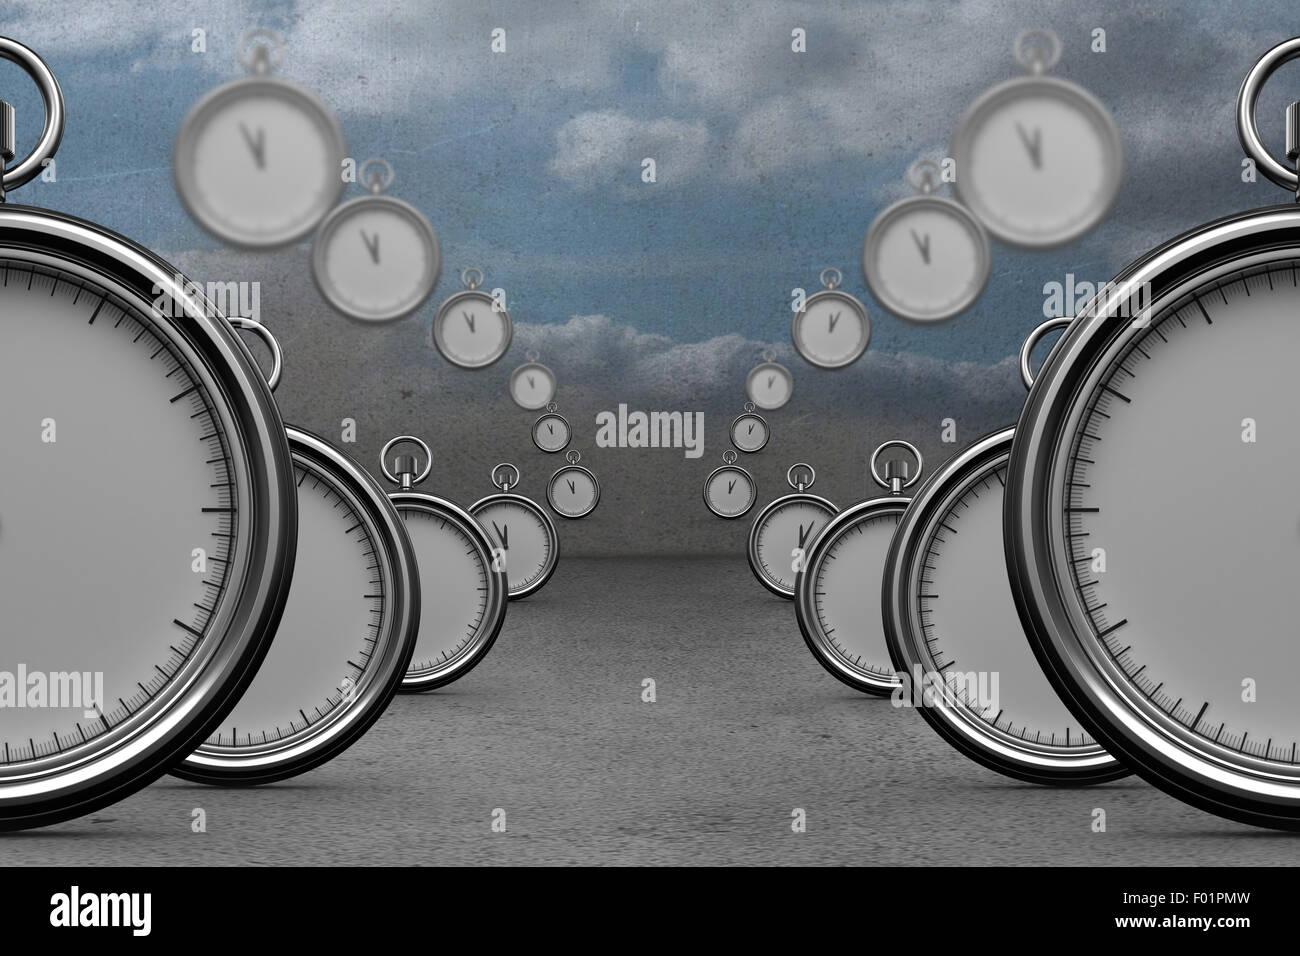 Composite image of clocks - Stock Image